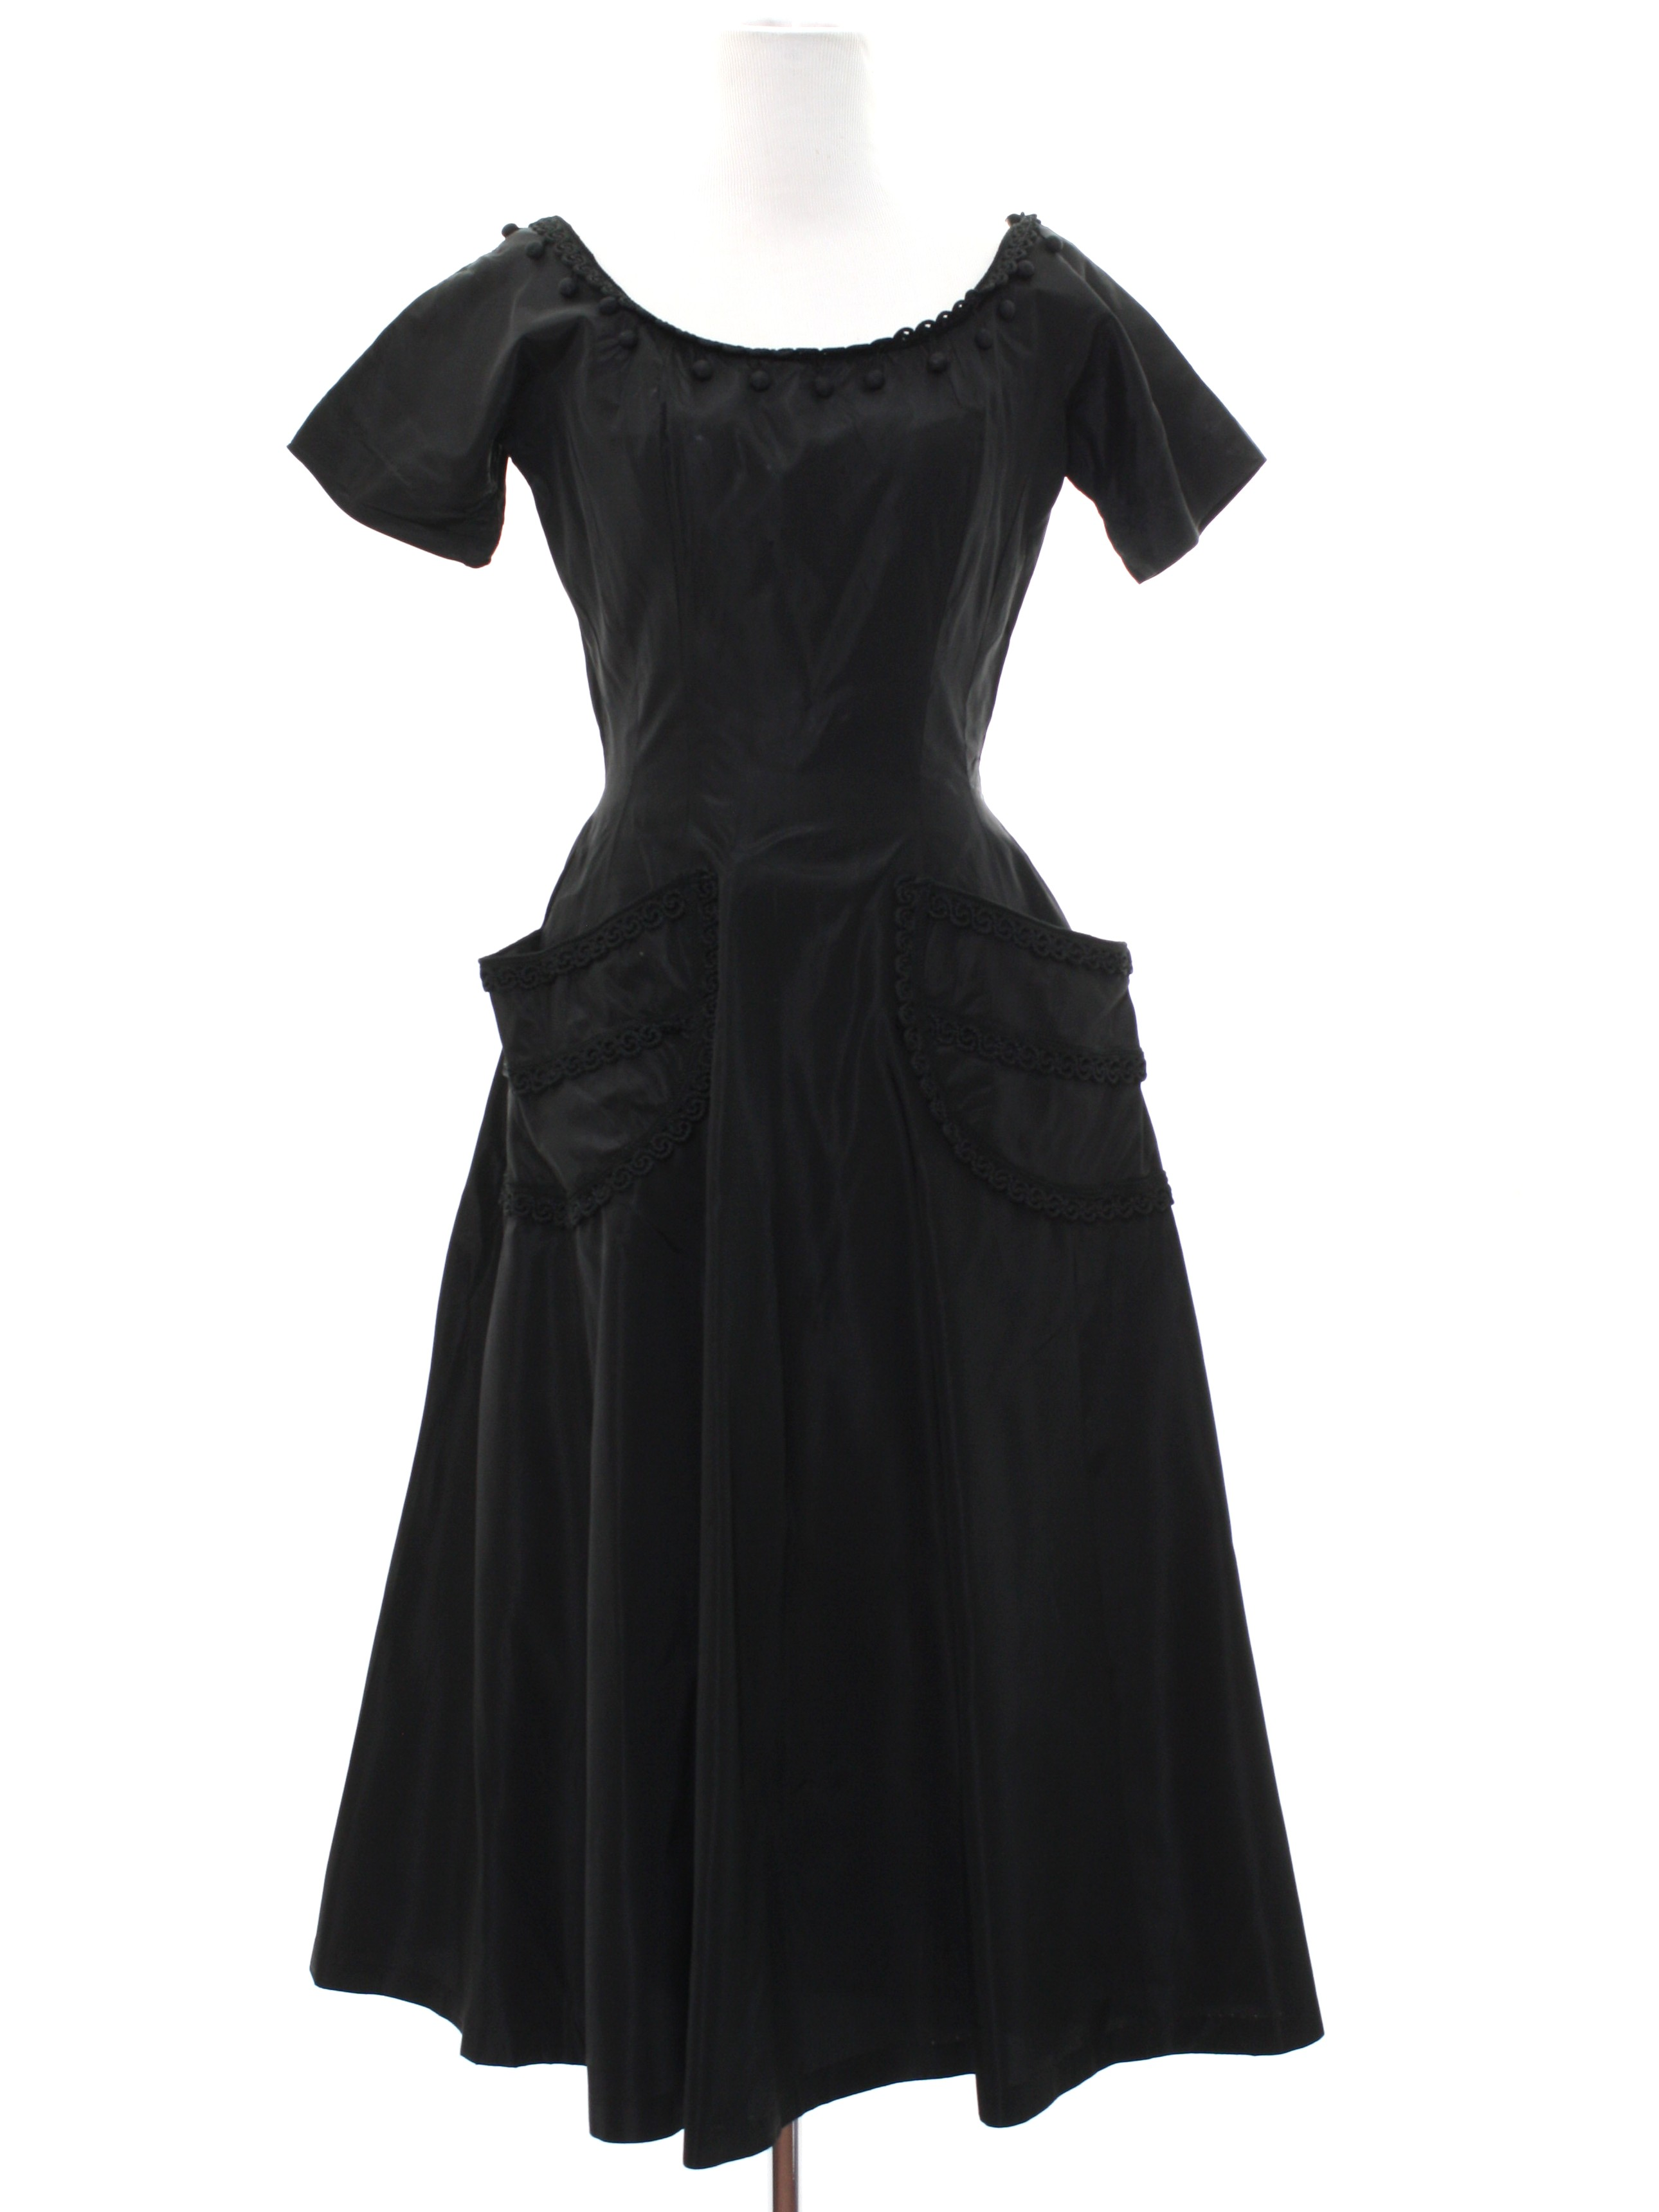 Vintage Chris Hepburn Original Fifties Cocktail Dress: 50s -Chris ...